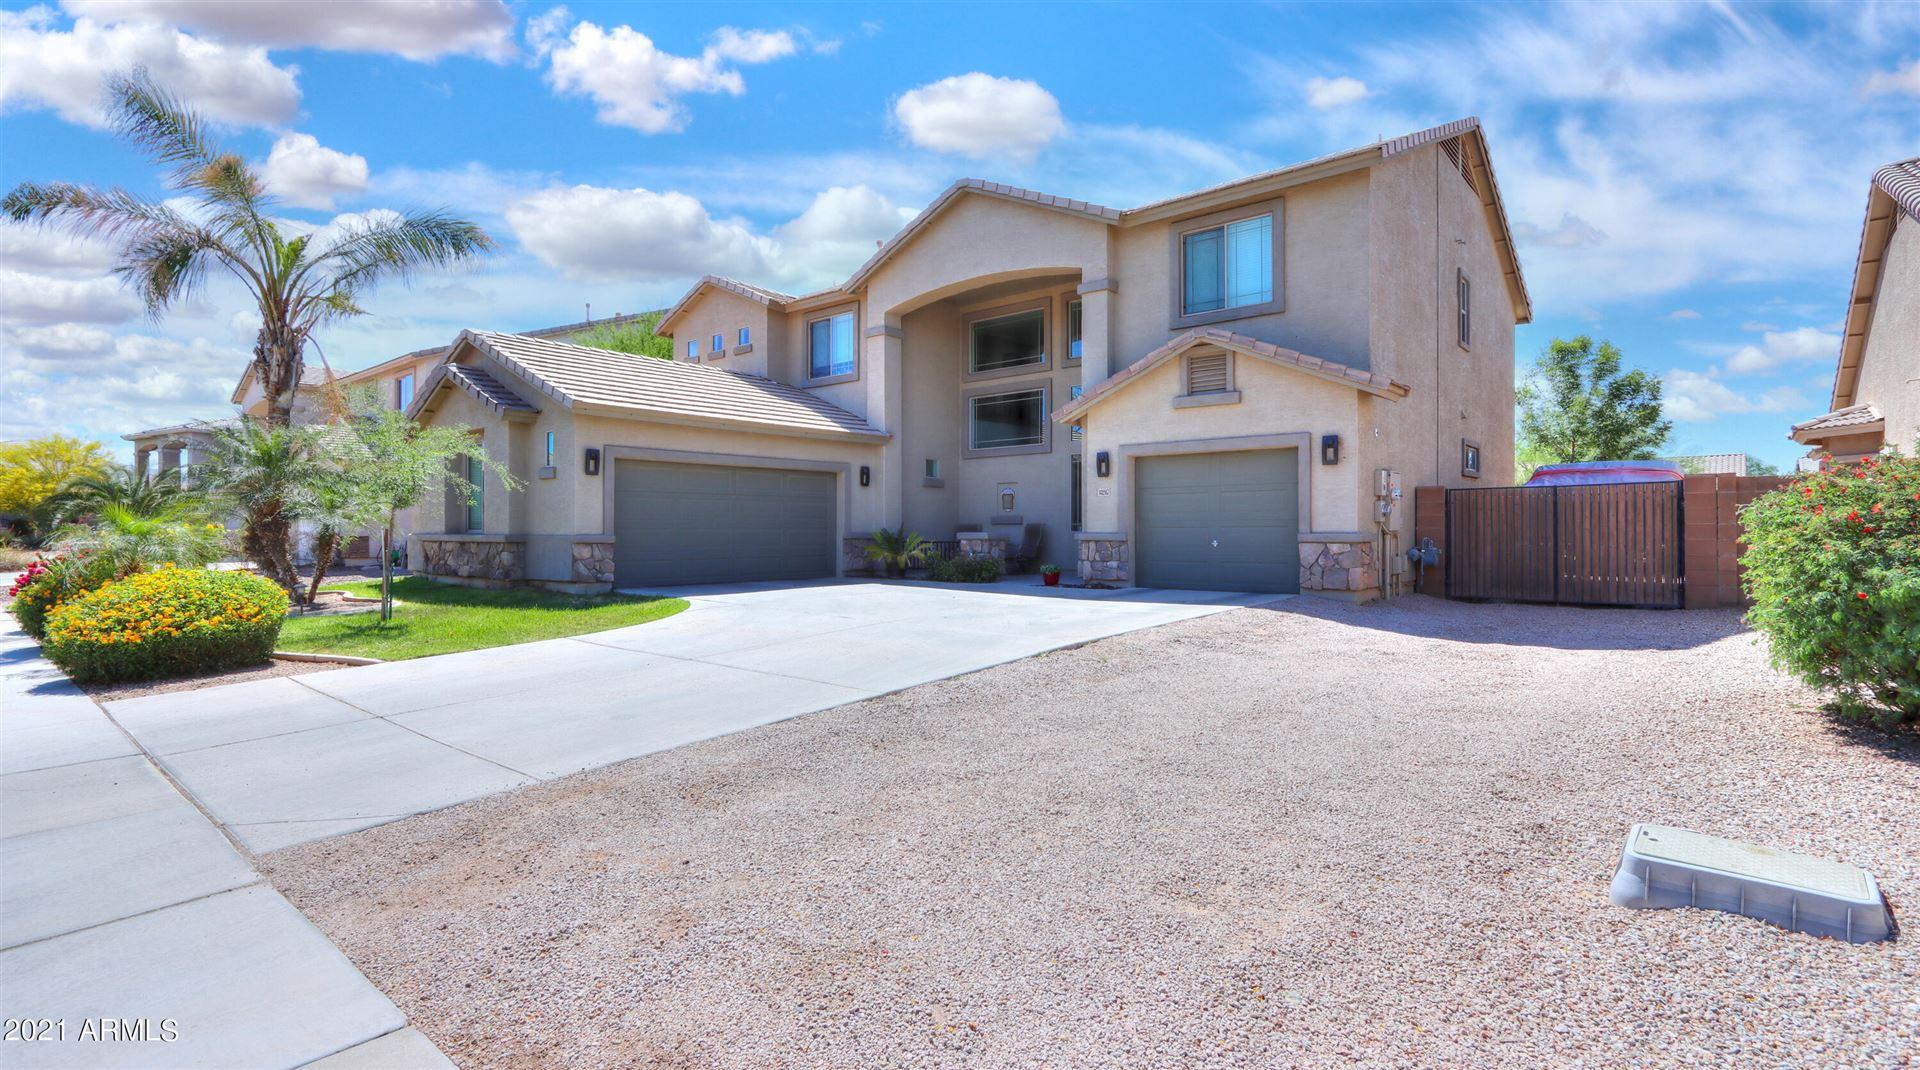 Photo of 43247 W MCCLELLAND Drive, Maricopa, AZ 85138 (MLS # 6230543)